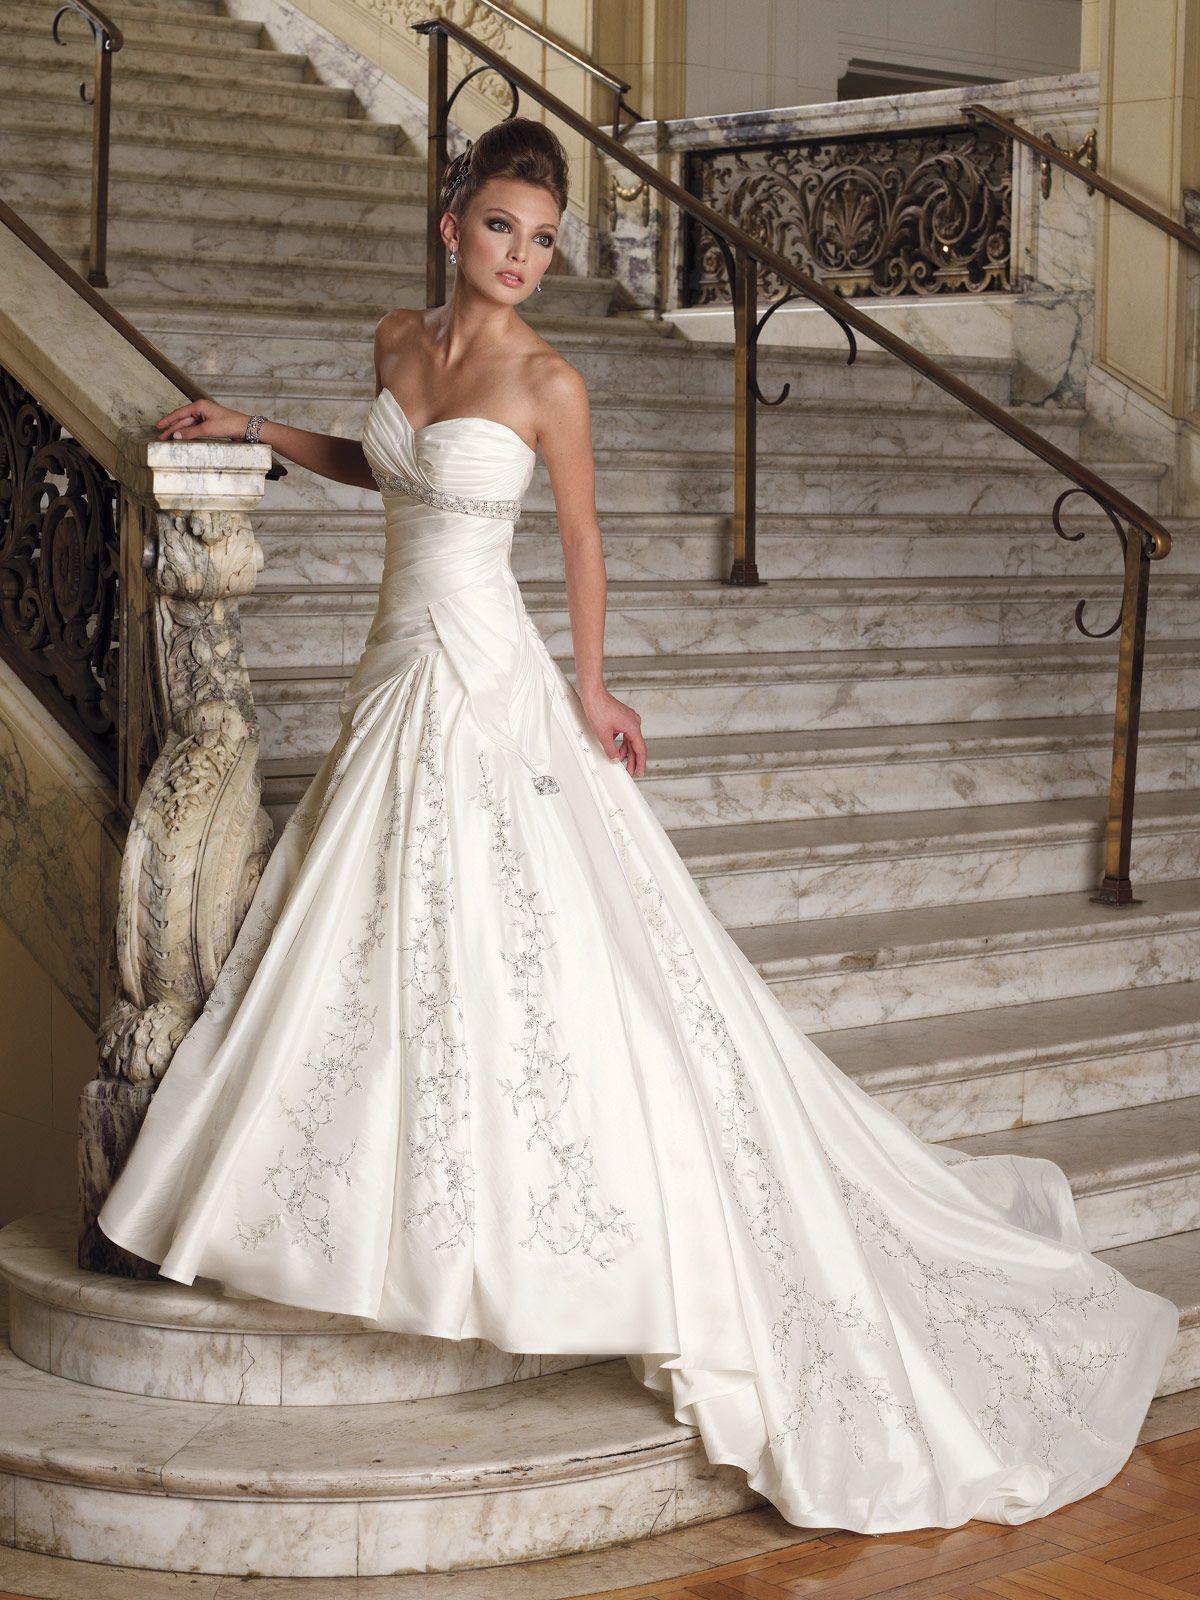 Stunning Image Of Most Beautiful Wedding